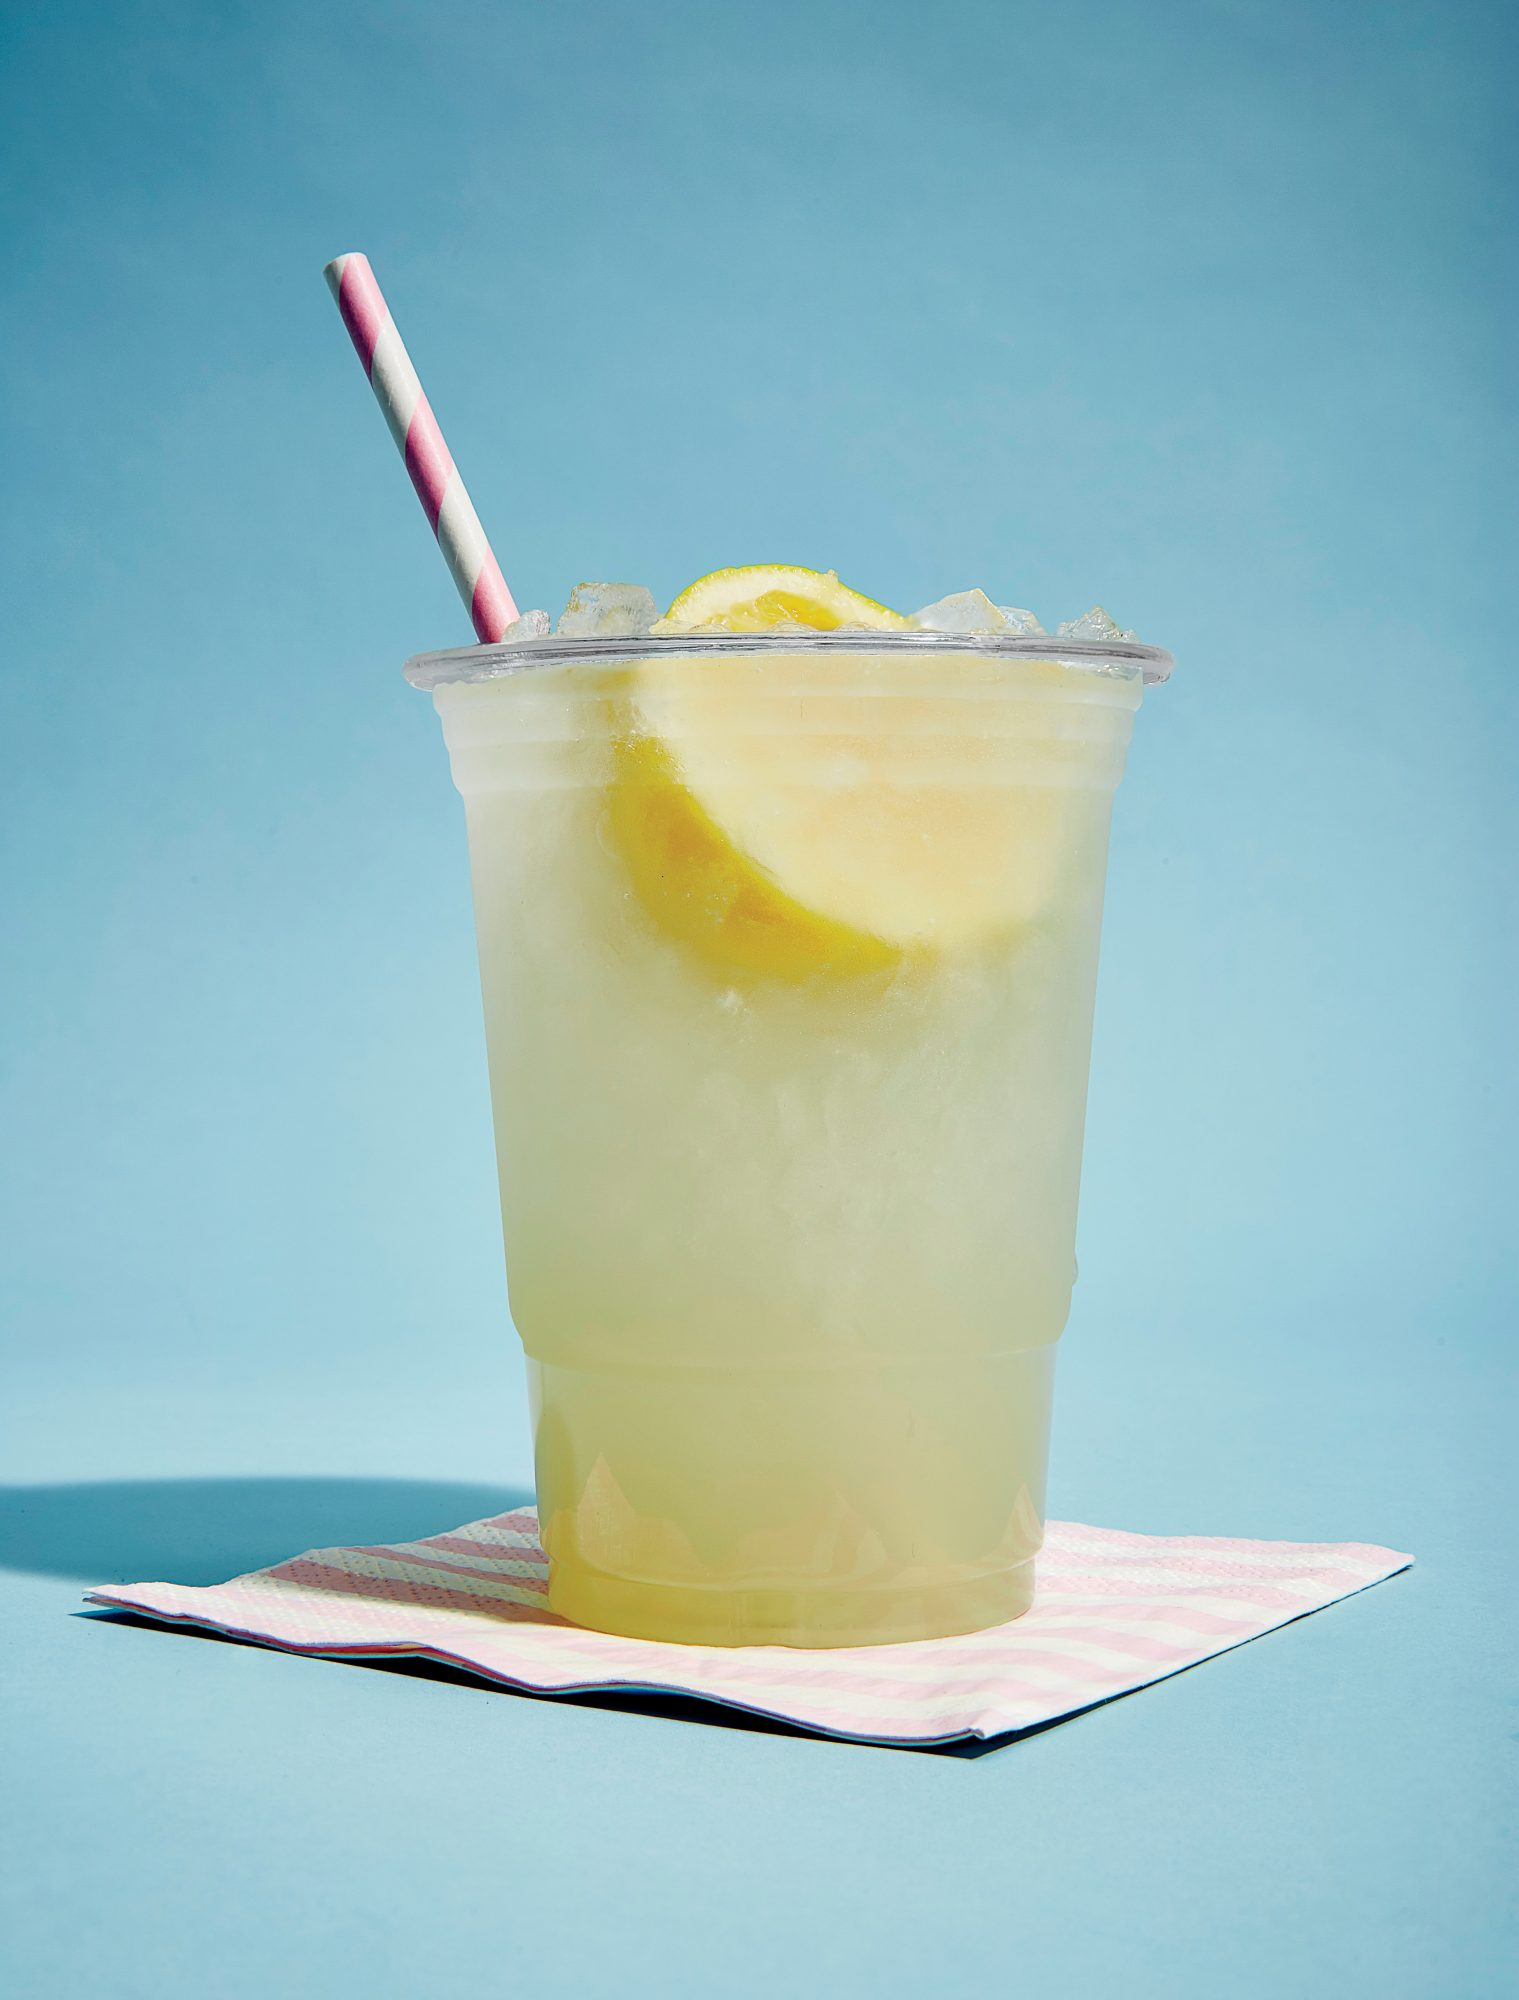 summer-sweet-lemonade-cl.jpg?itok=Ke77i3ck